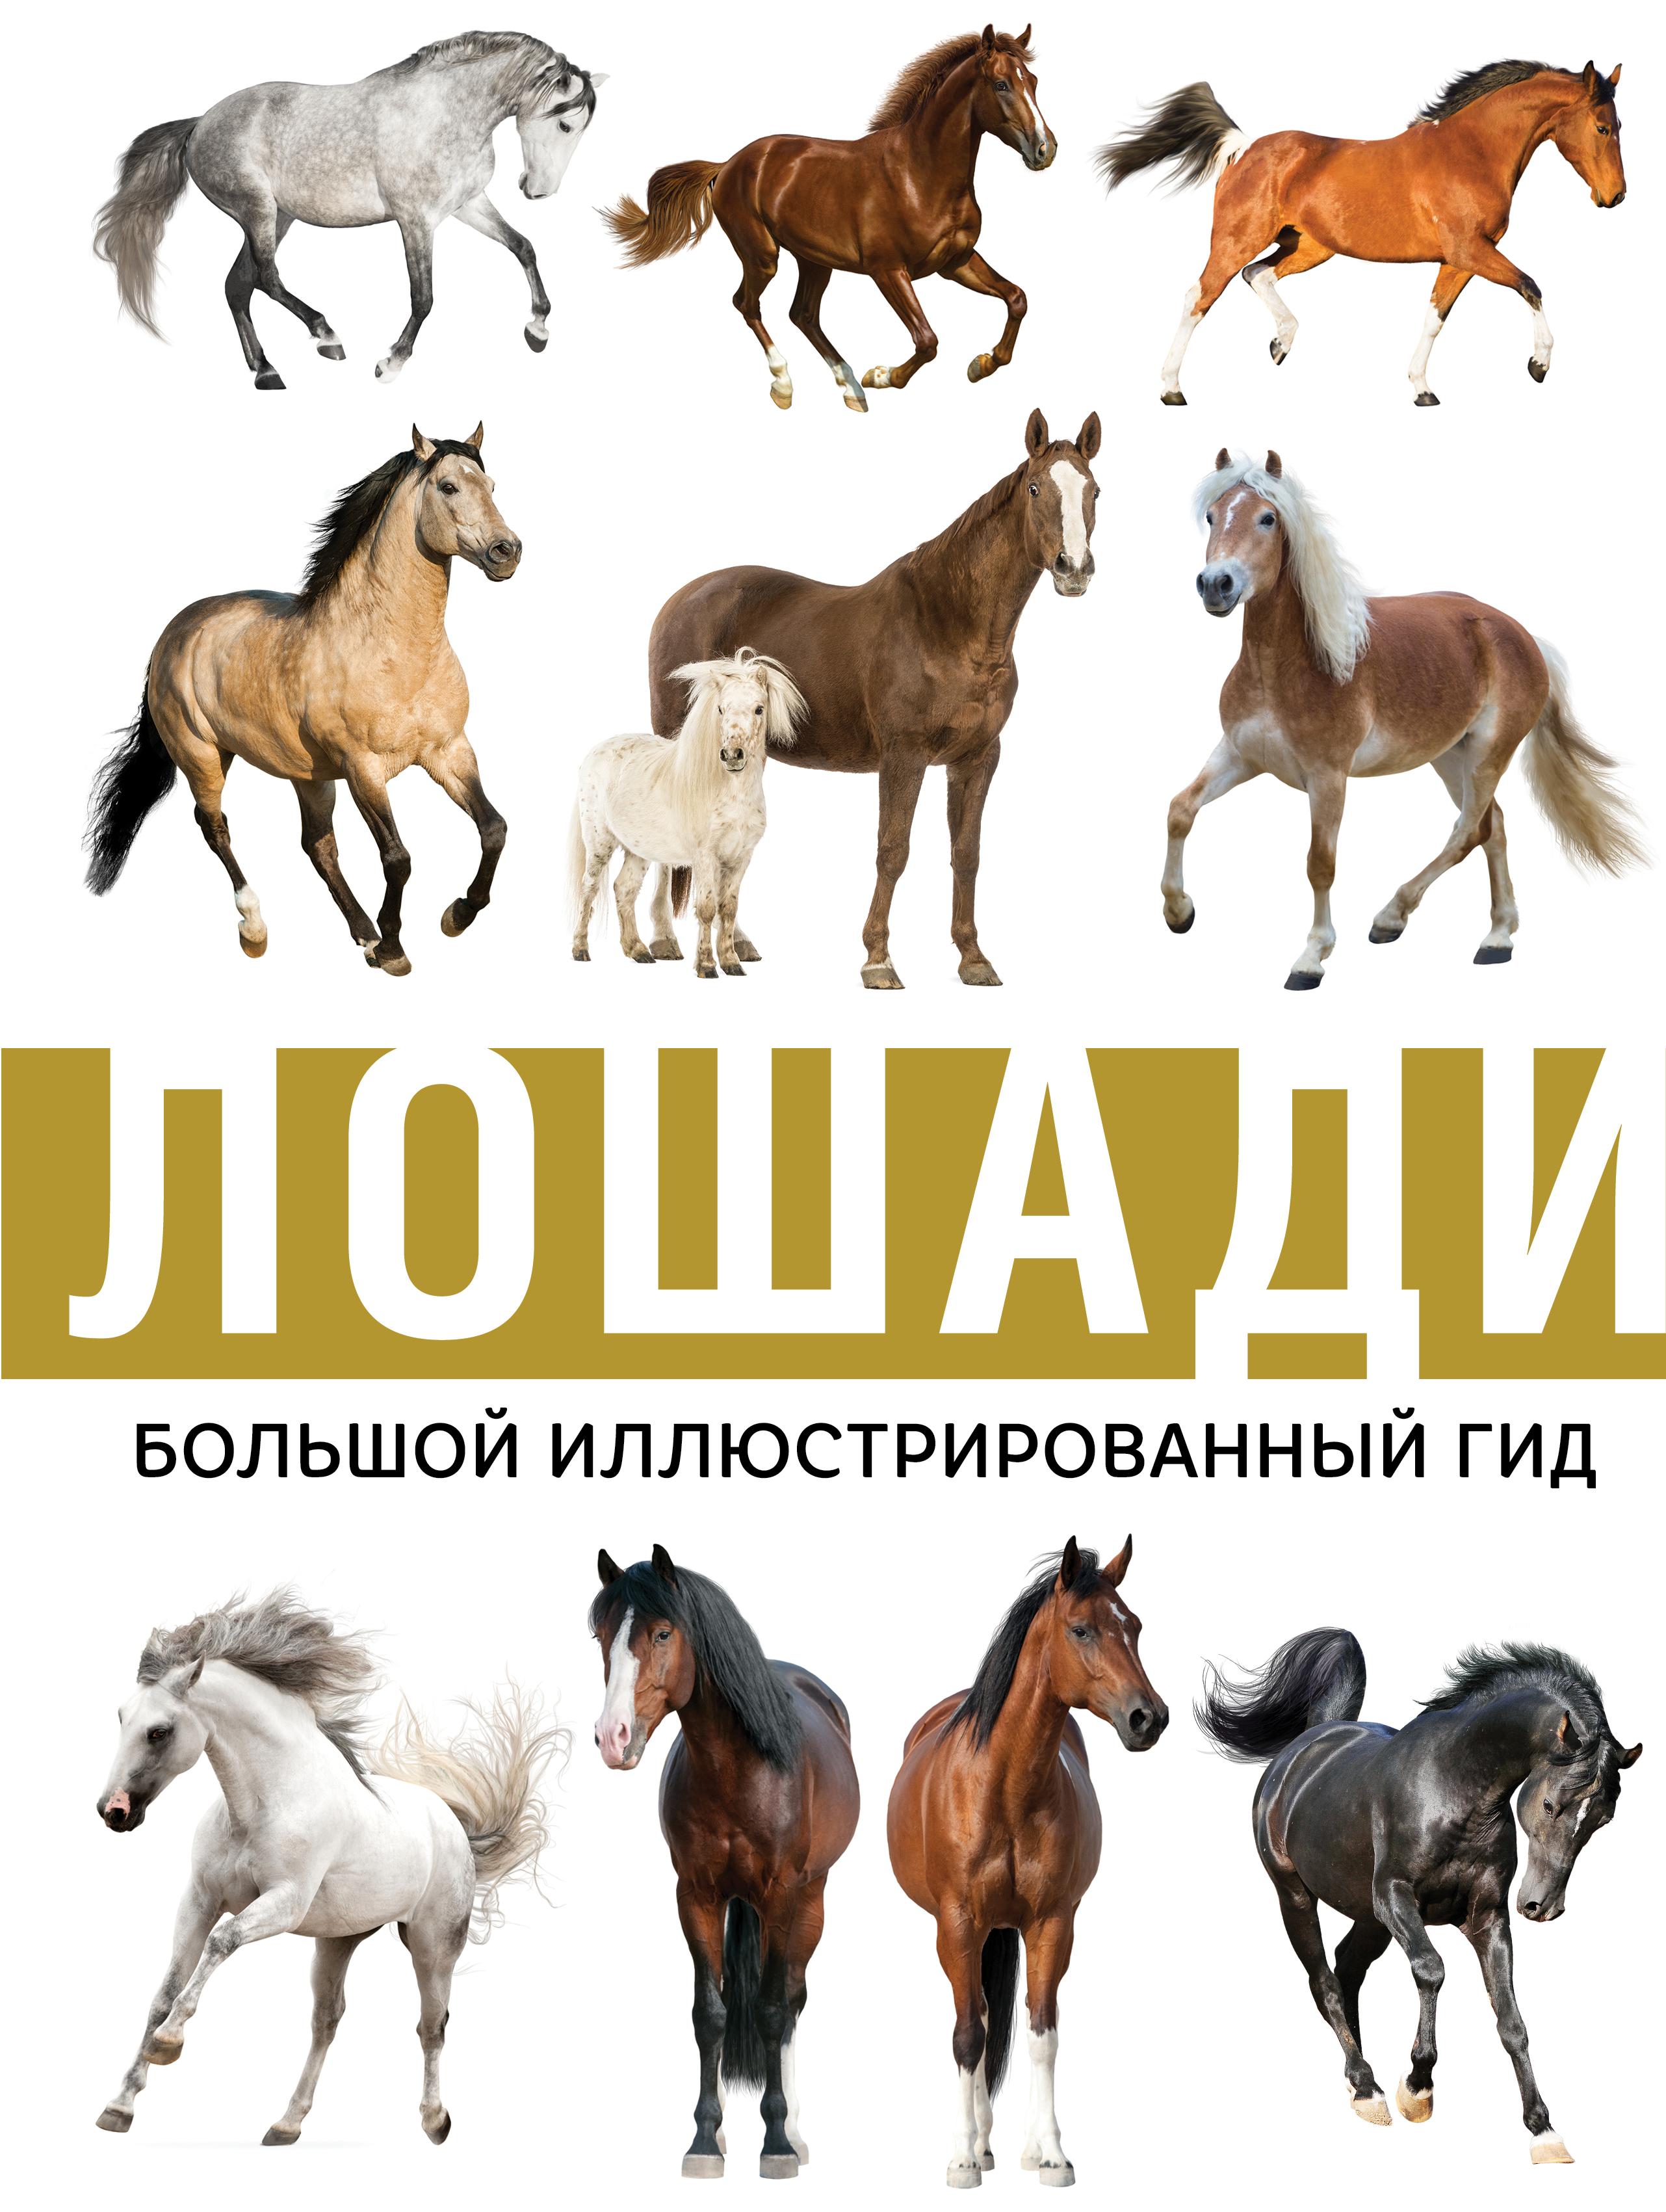 Книга с картинками о лошадях